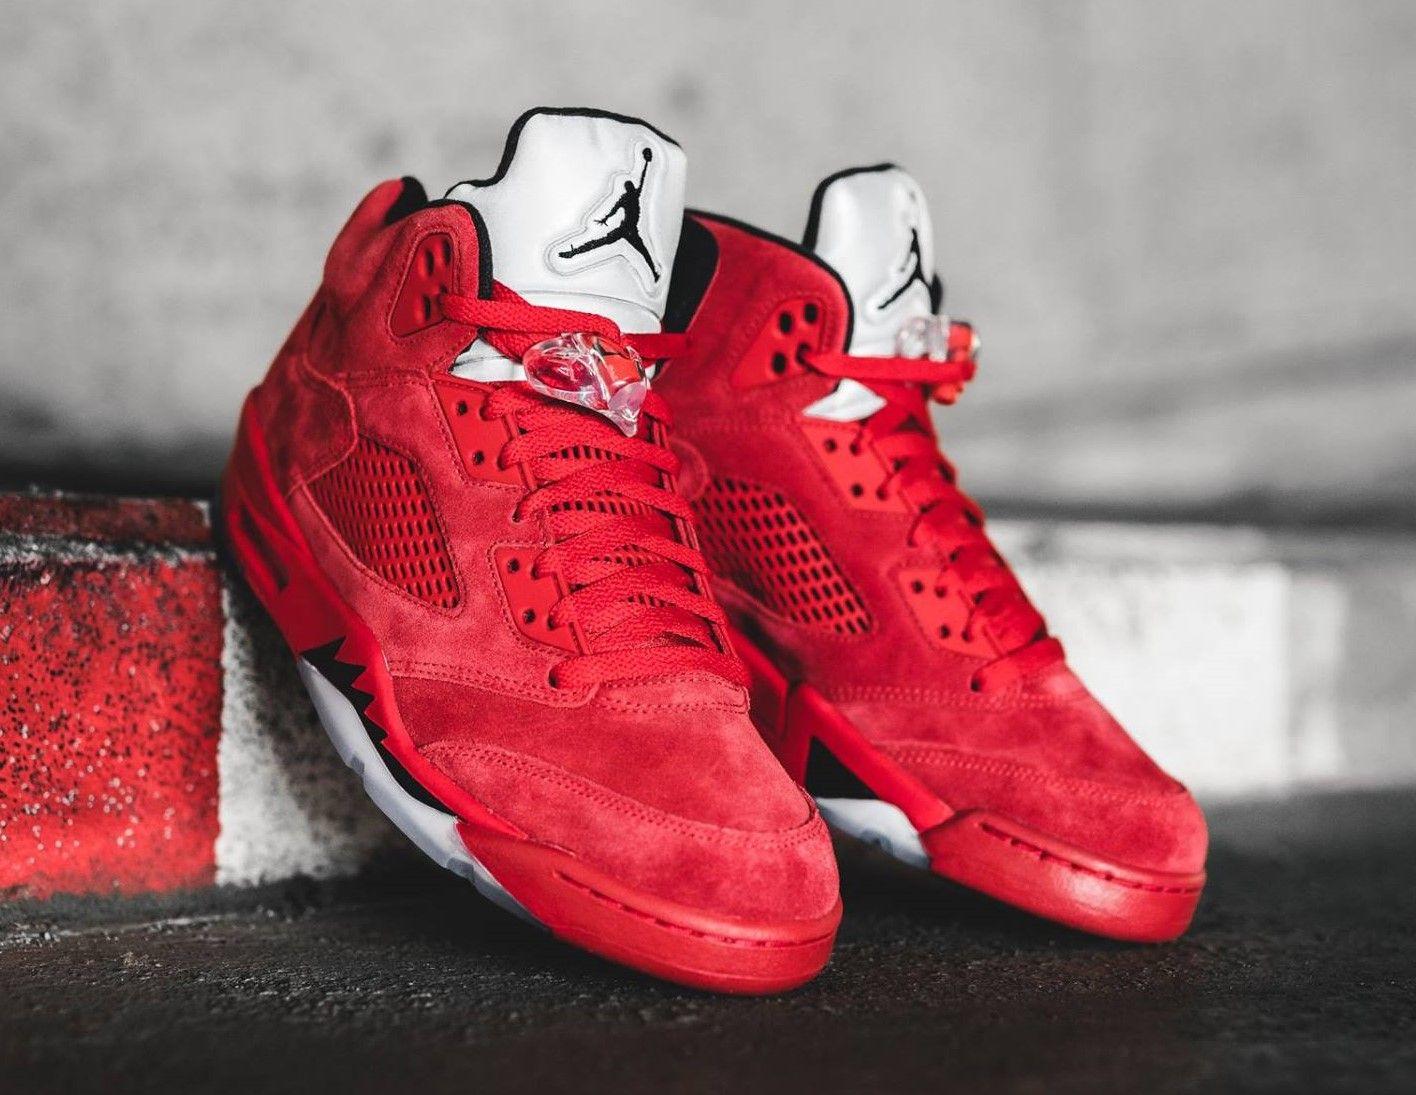 918a0e7399a20 Air Jordan 5 Red Suede In 2009, Jordan Brand appeared the Raging Bull Air  Jordan 5. For 2017, they're set